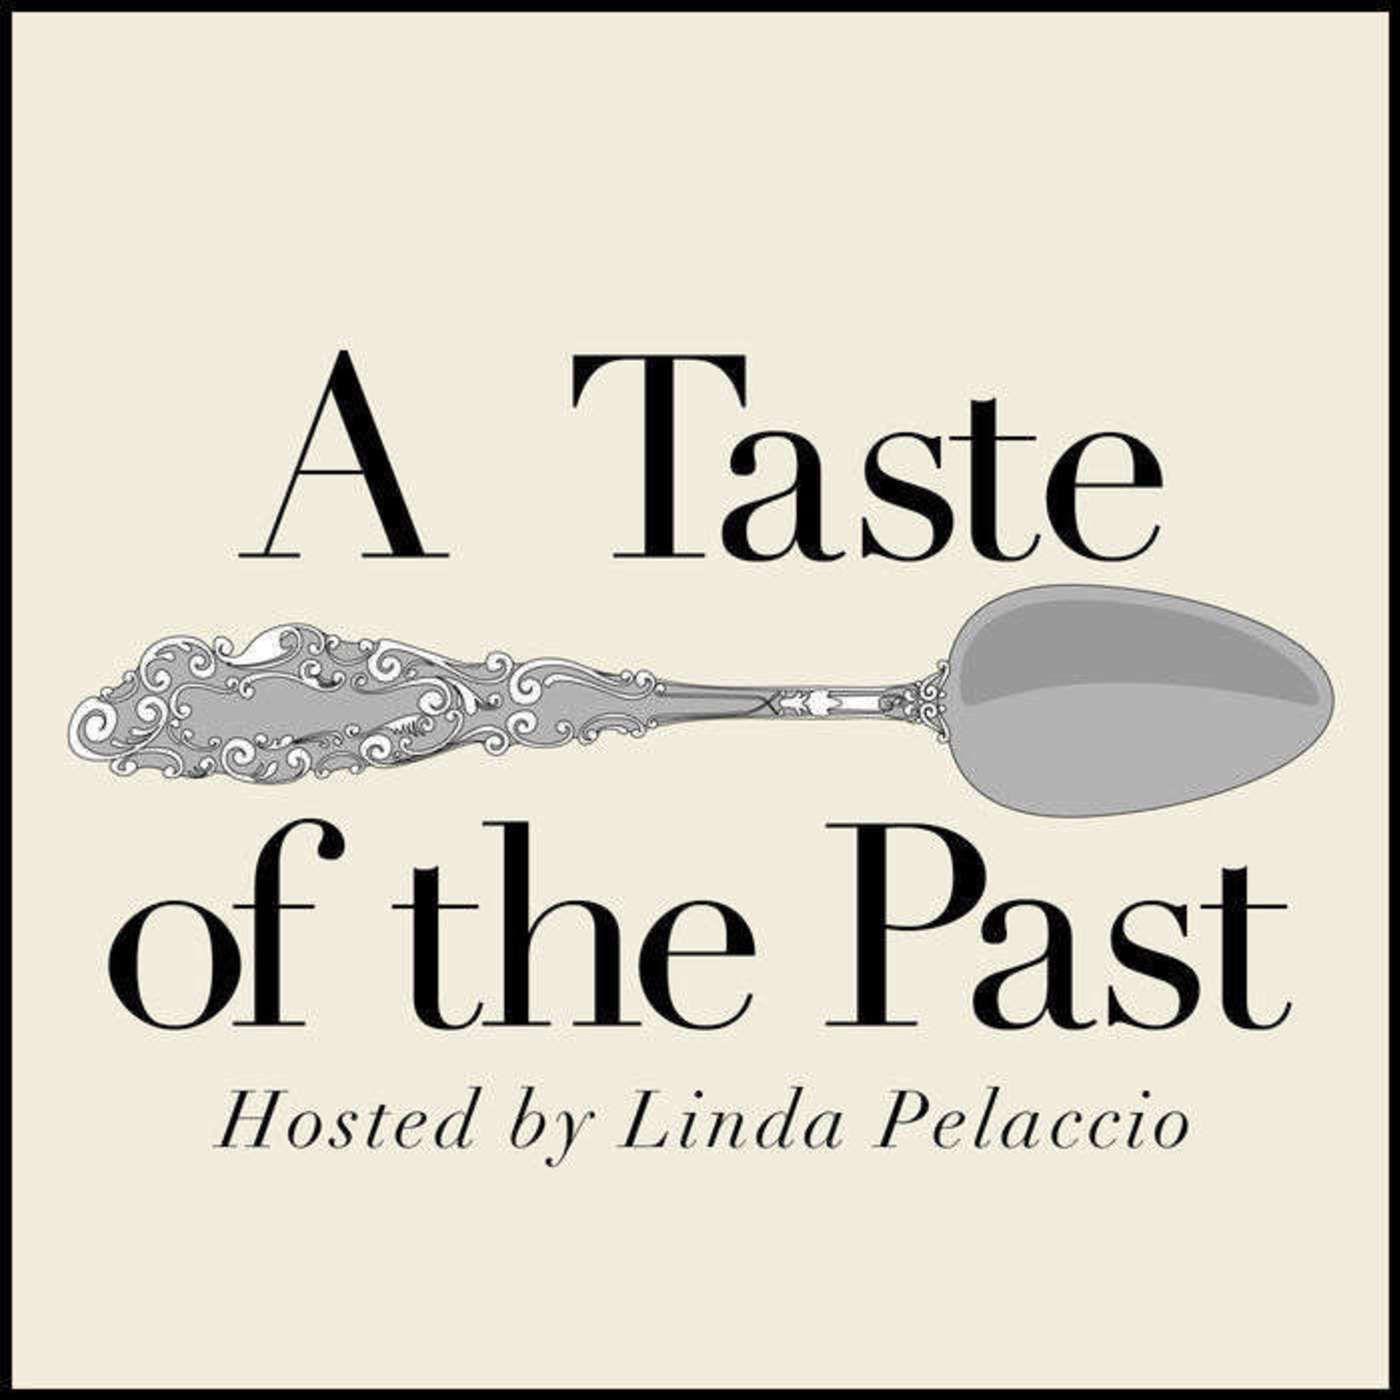 Episode 200: Italian Food & Feasts